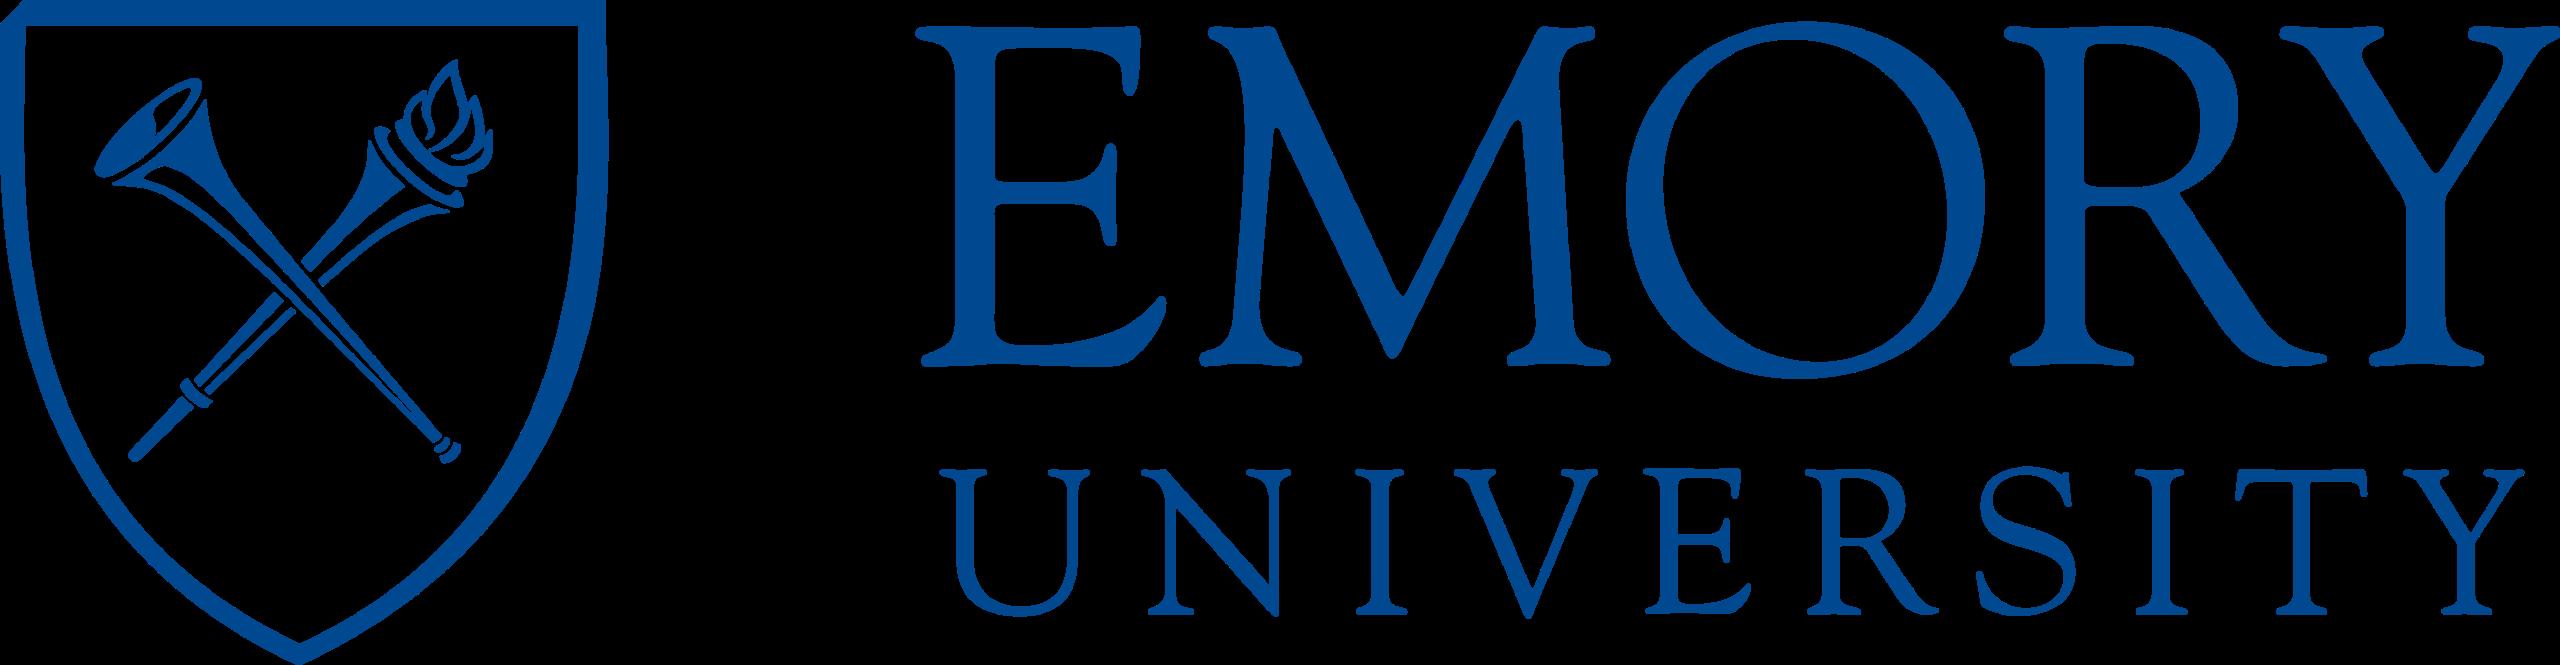 https://www.emory.edu/home/index.html